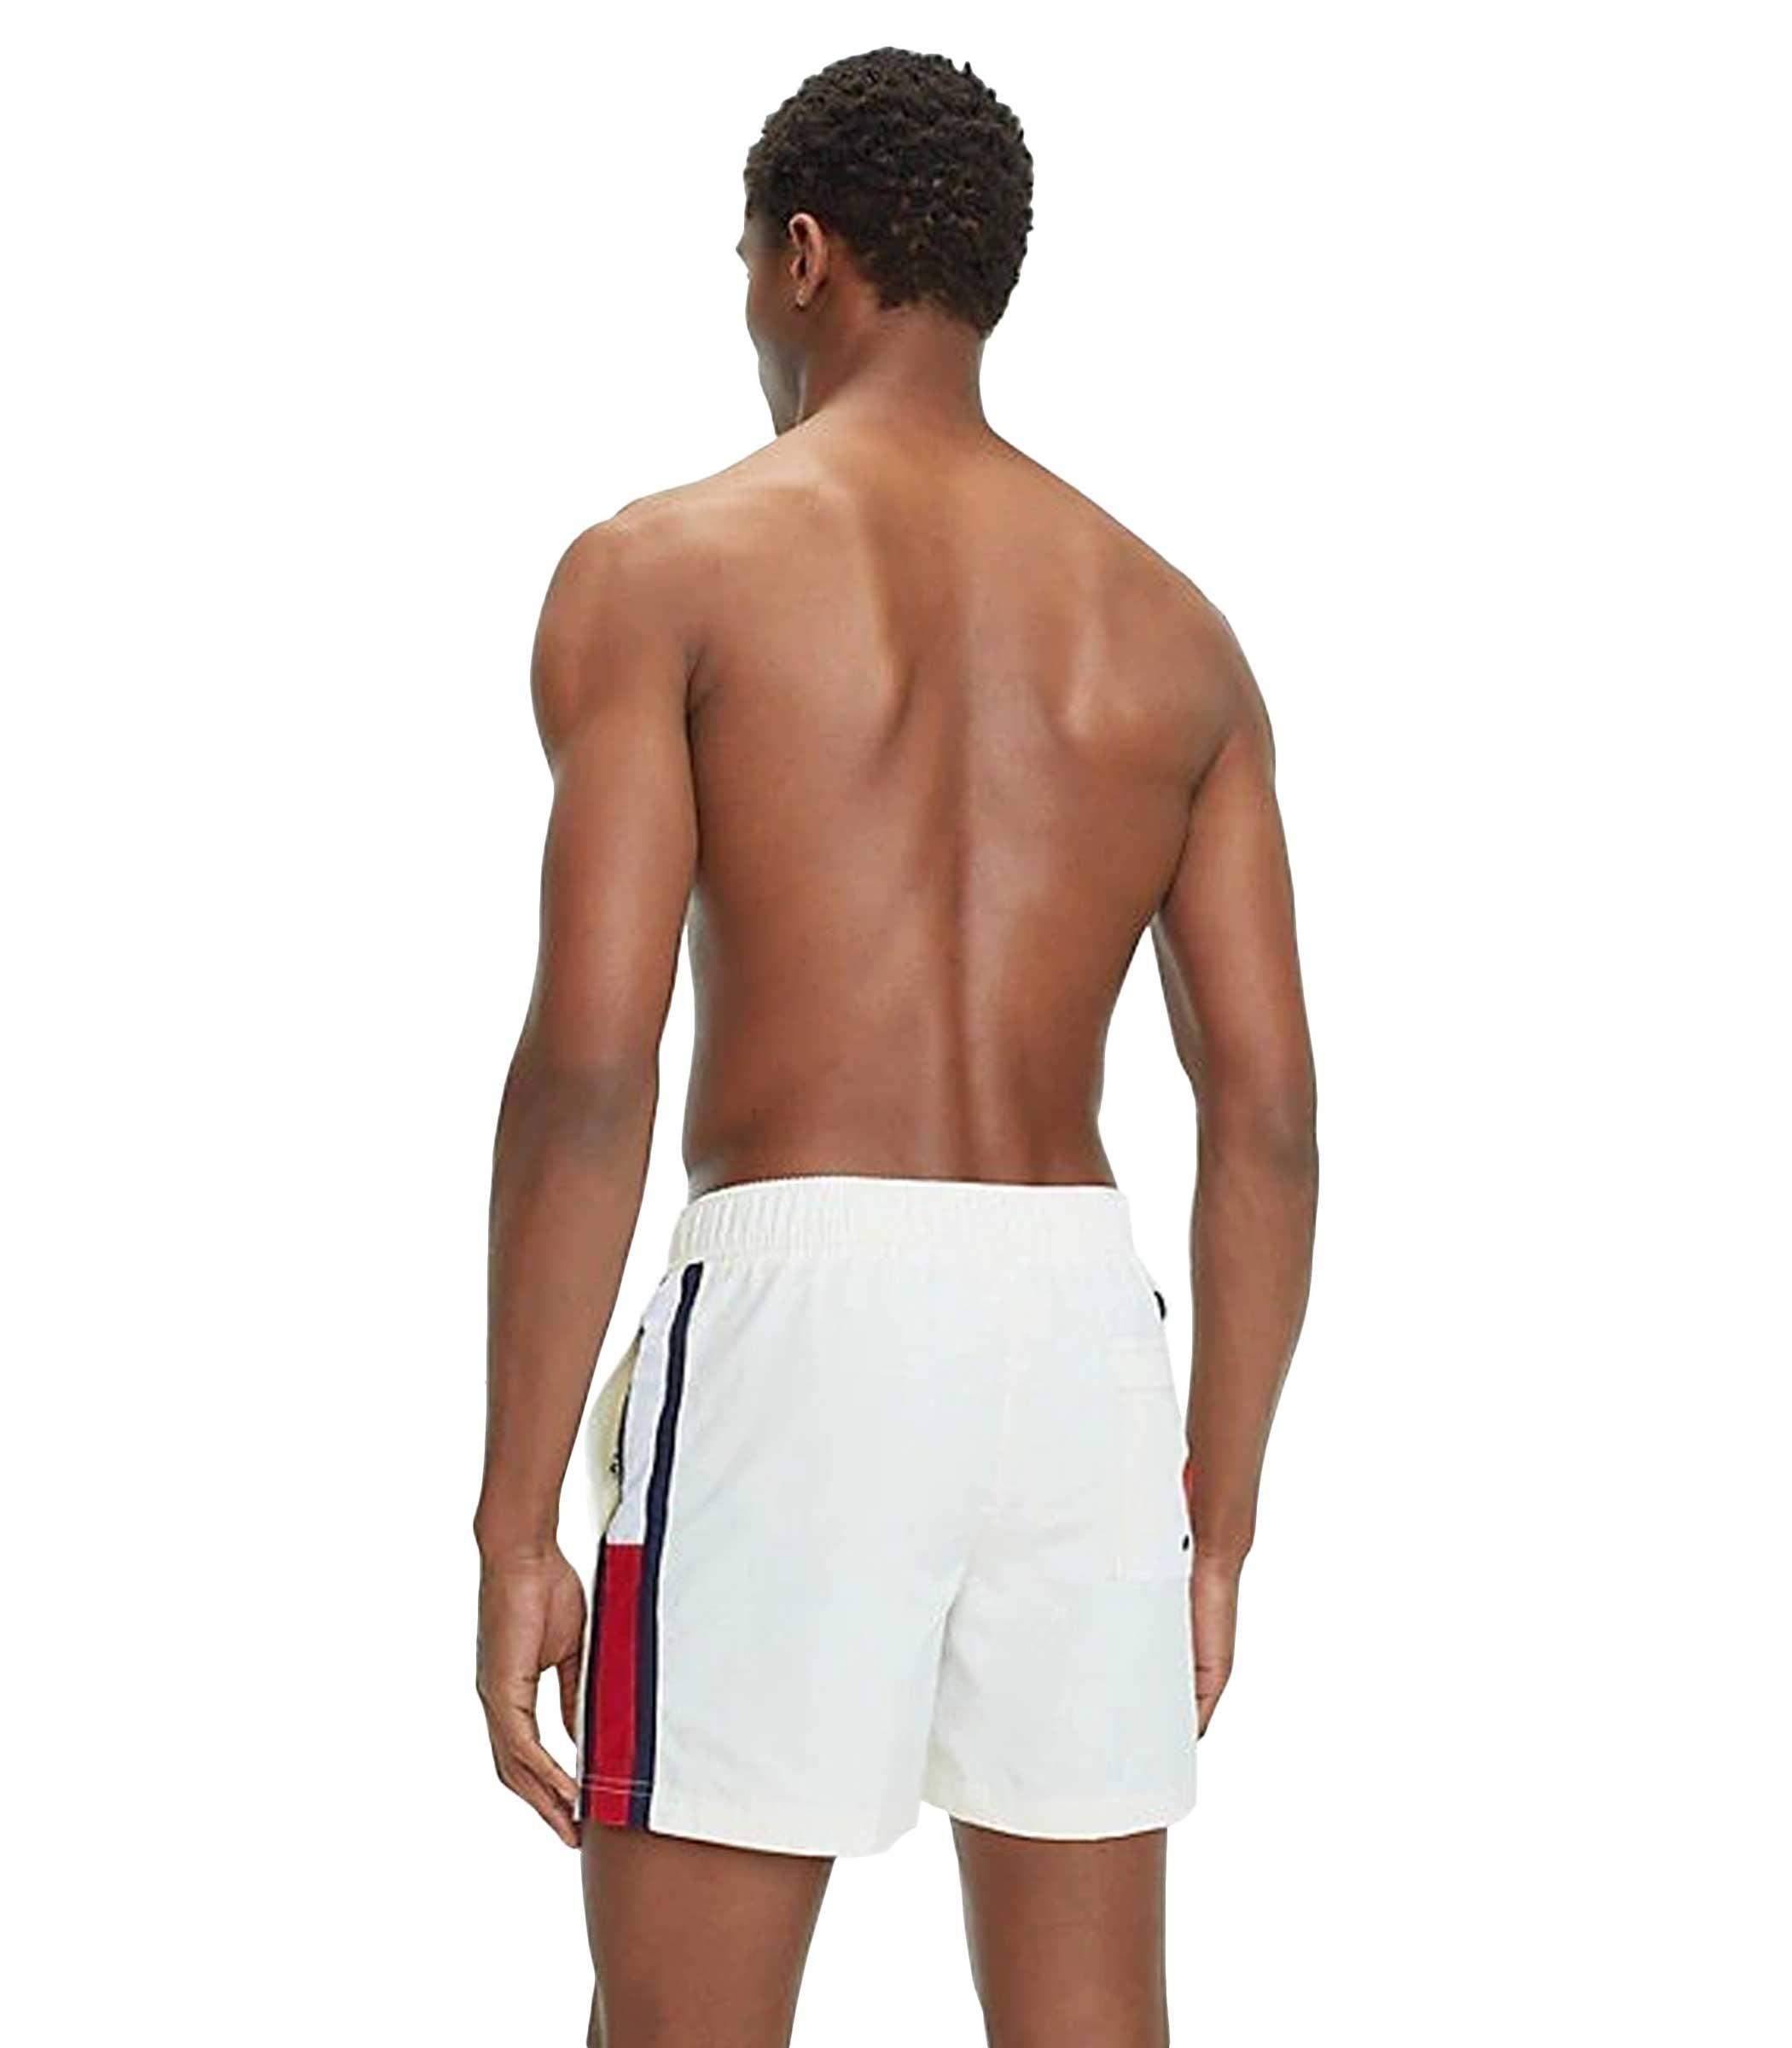 premium selection 1b533 1875d Costume Tommy Hilfiger shorts con lacci da uomo rif. UM0UM01079